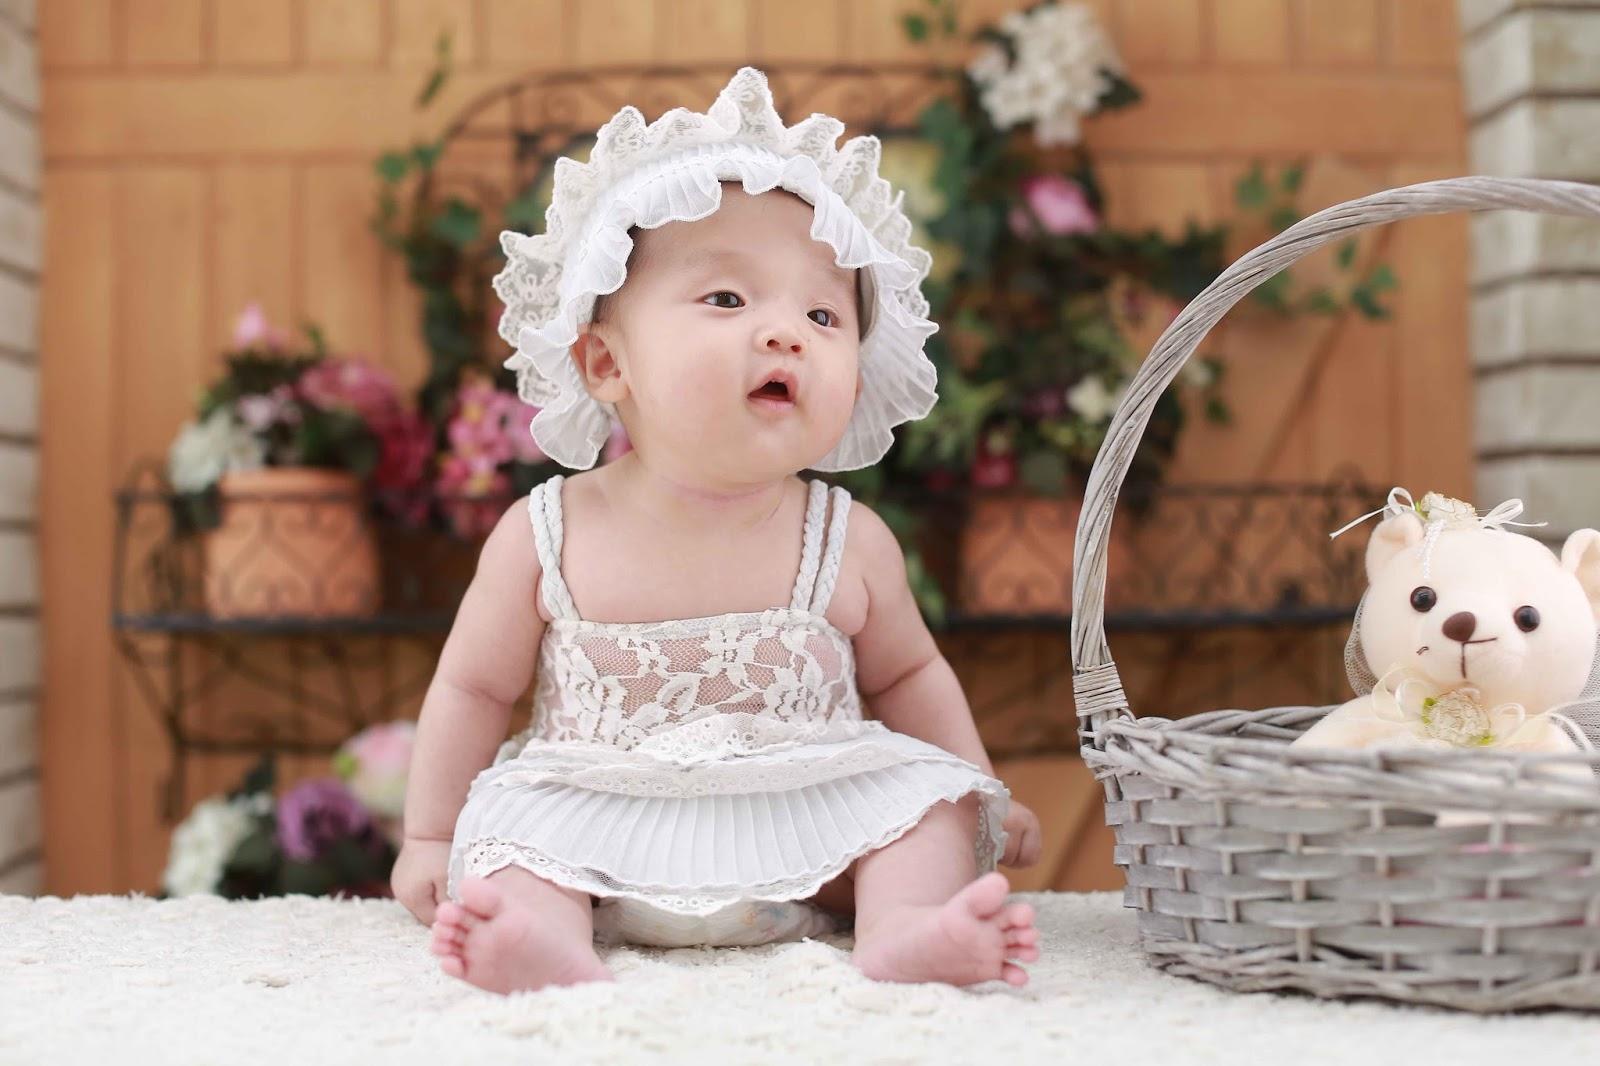 sweet babies wallpapers